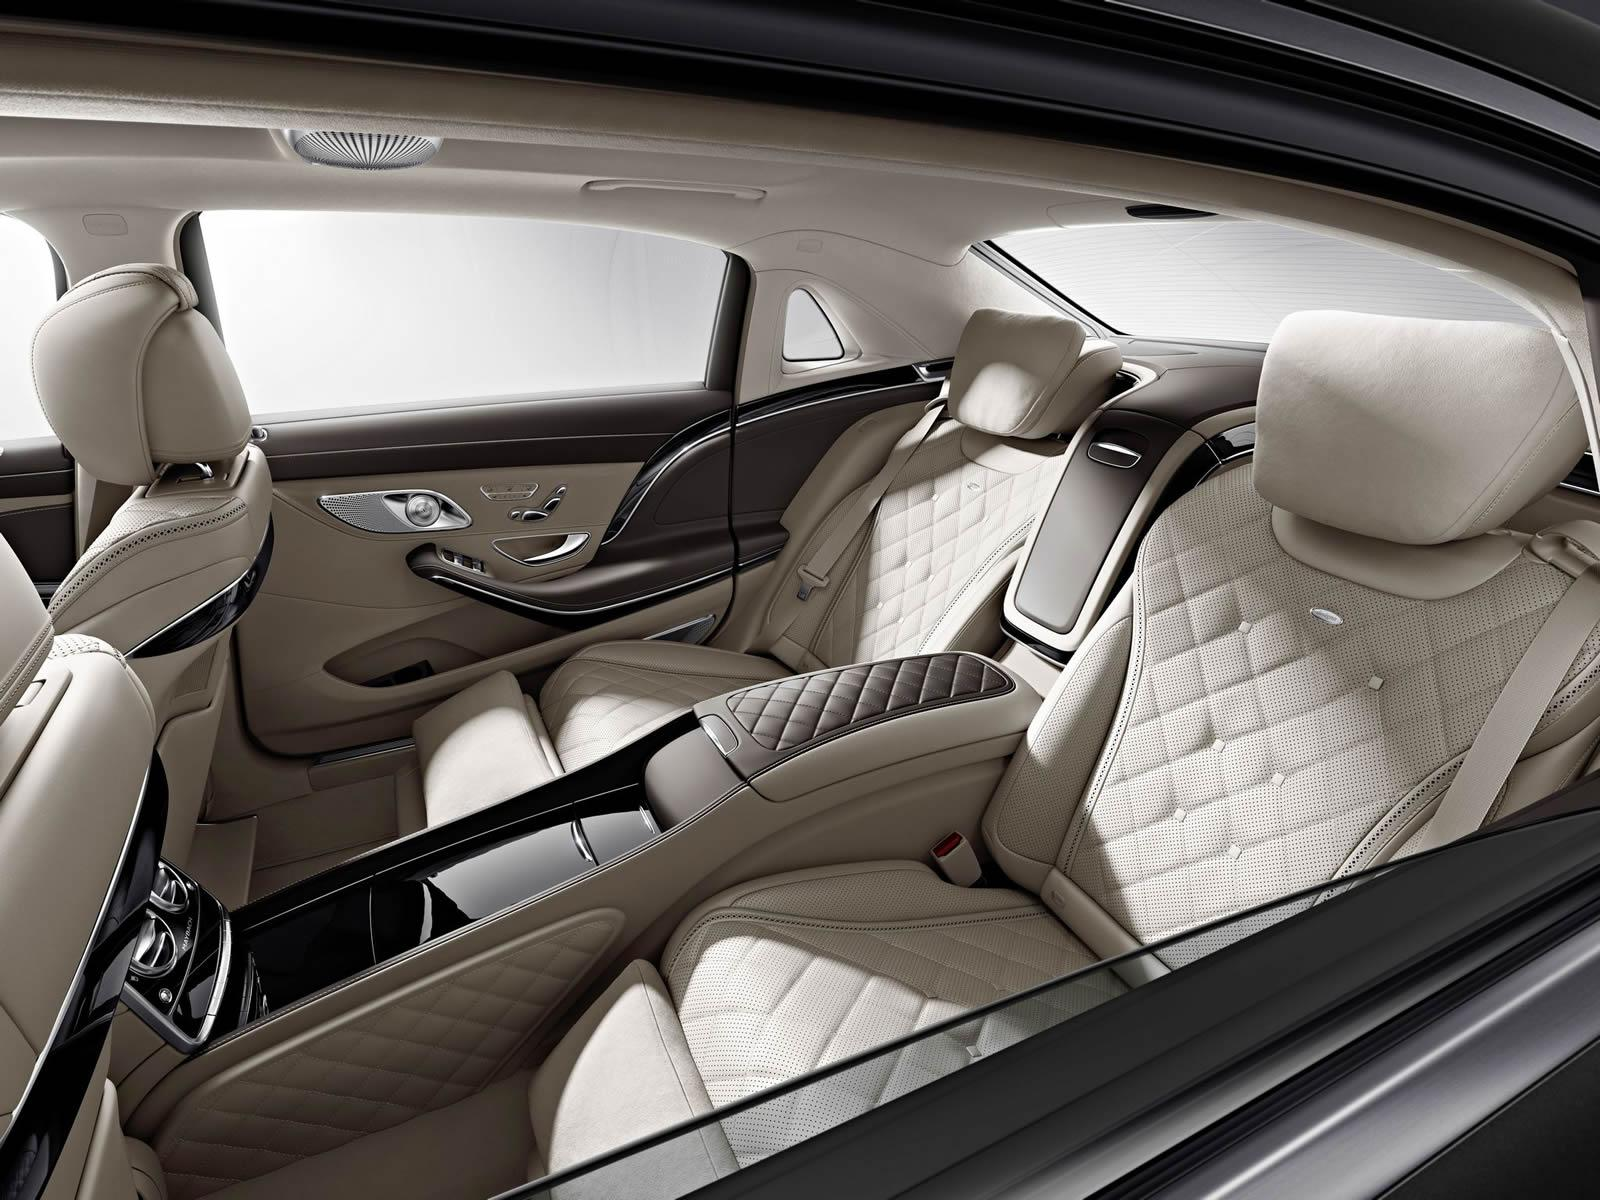 2015 mercedes benz s600 interior 2015 mercedes benz s600 interior ...